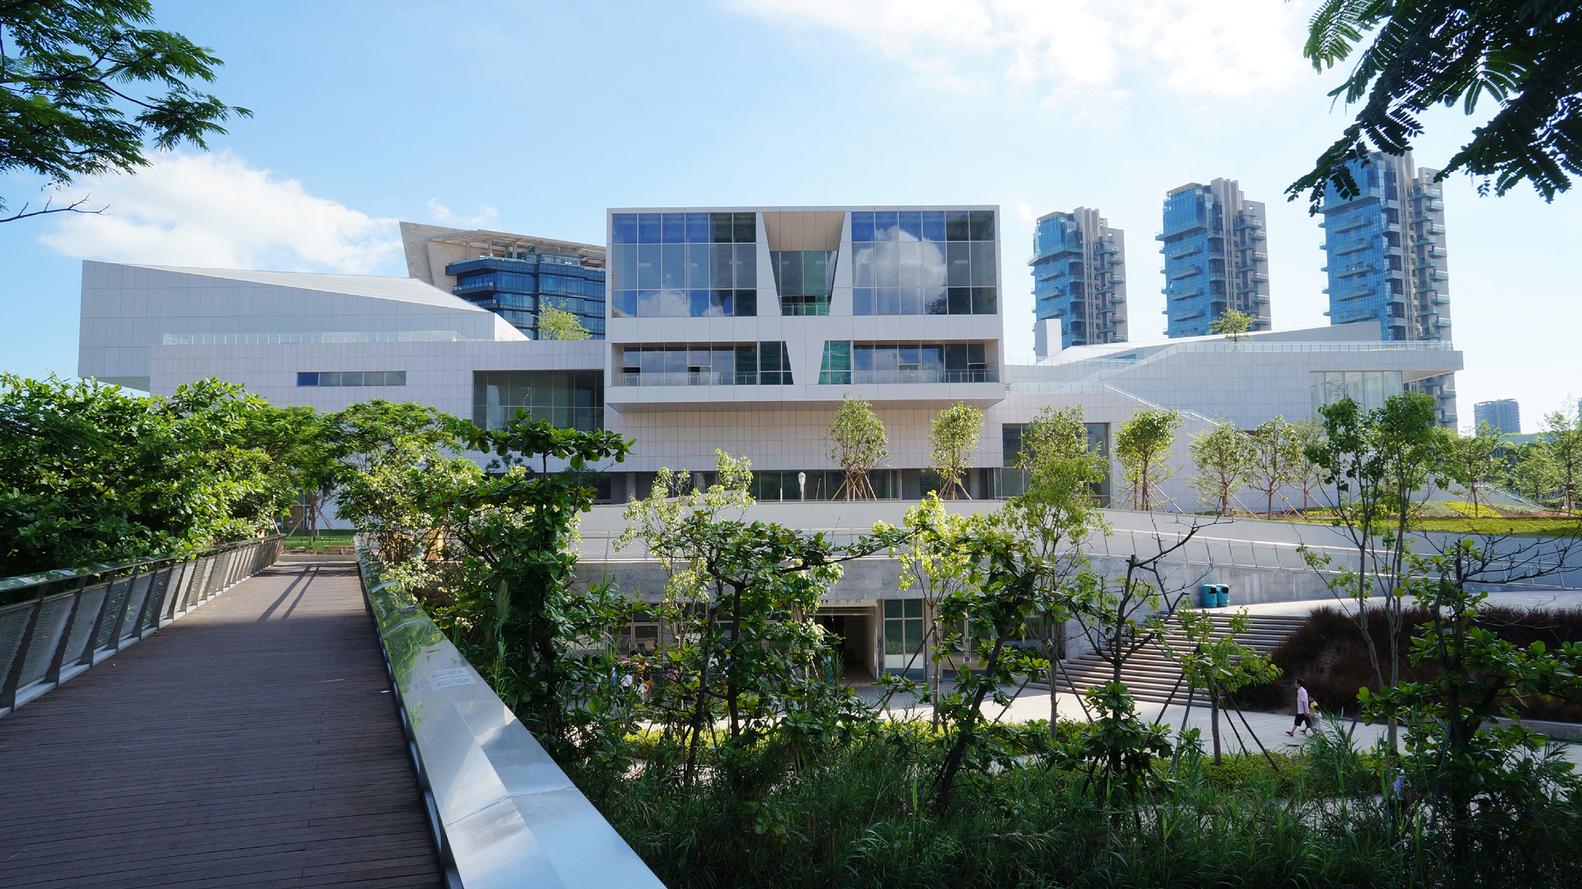 Shenzhen Sea World Culture and Arts Center / Maki and Associates,Park. Image Courtesy of Maki and Associates